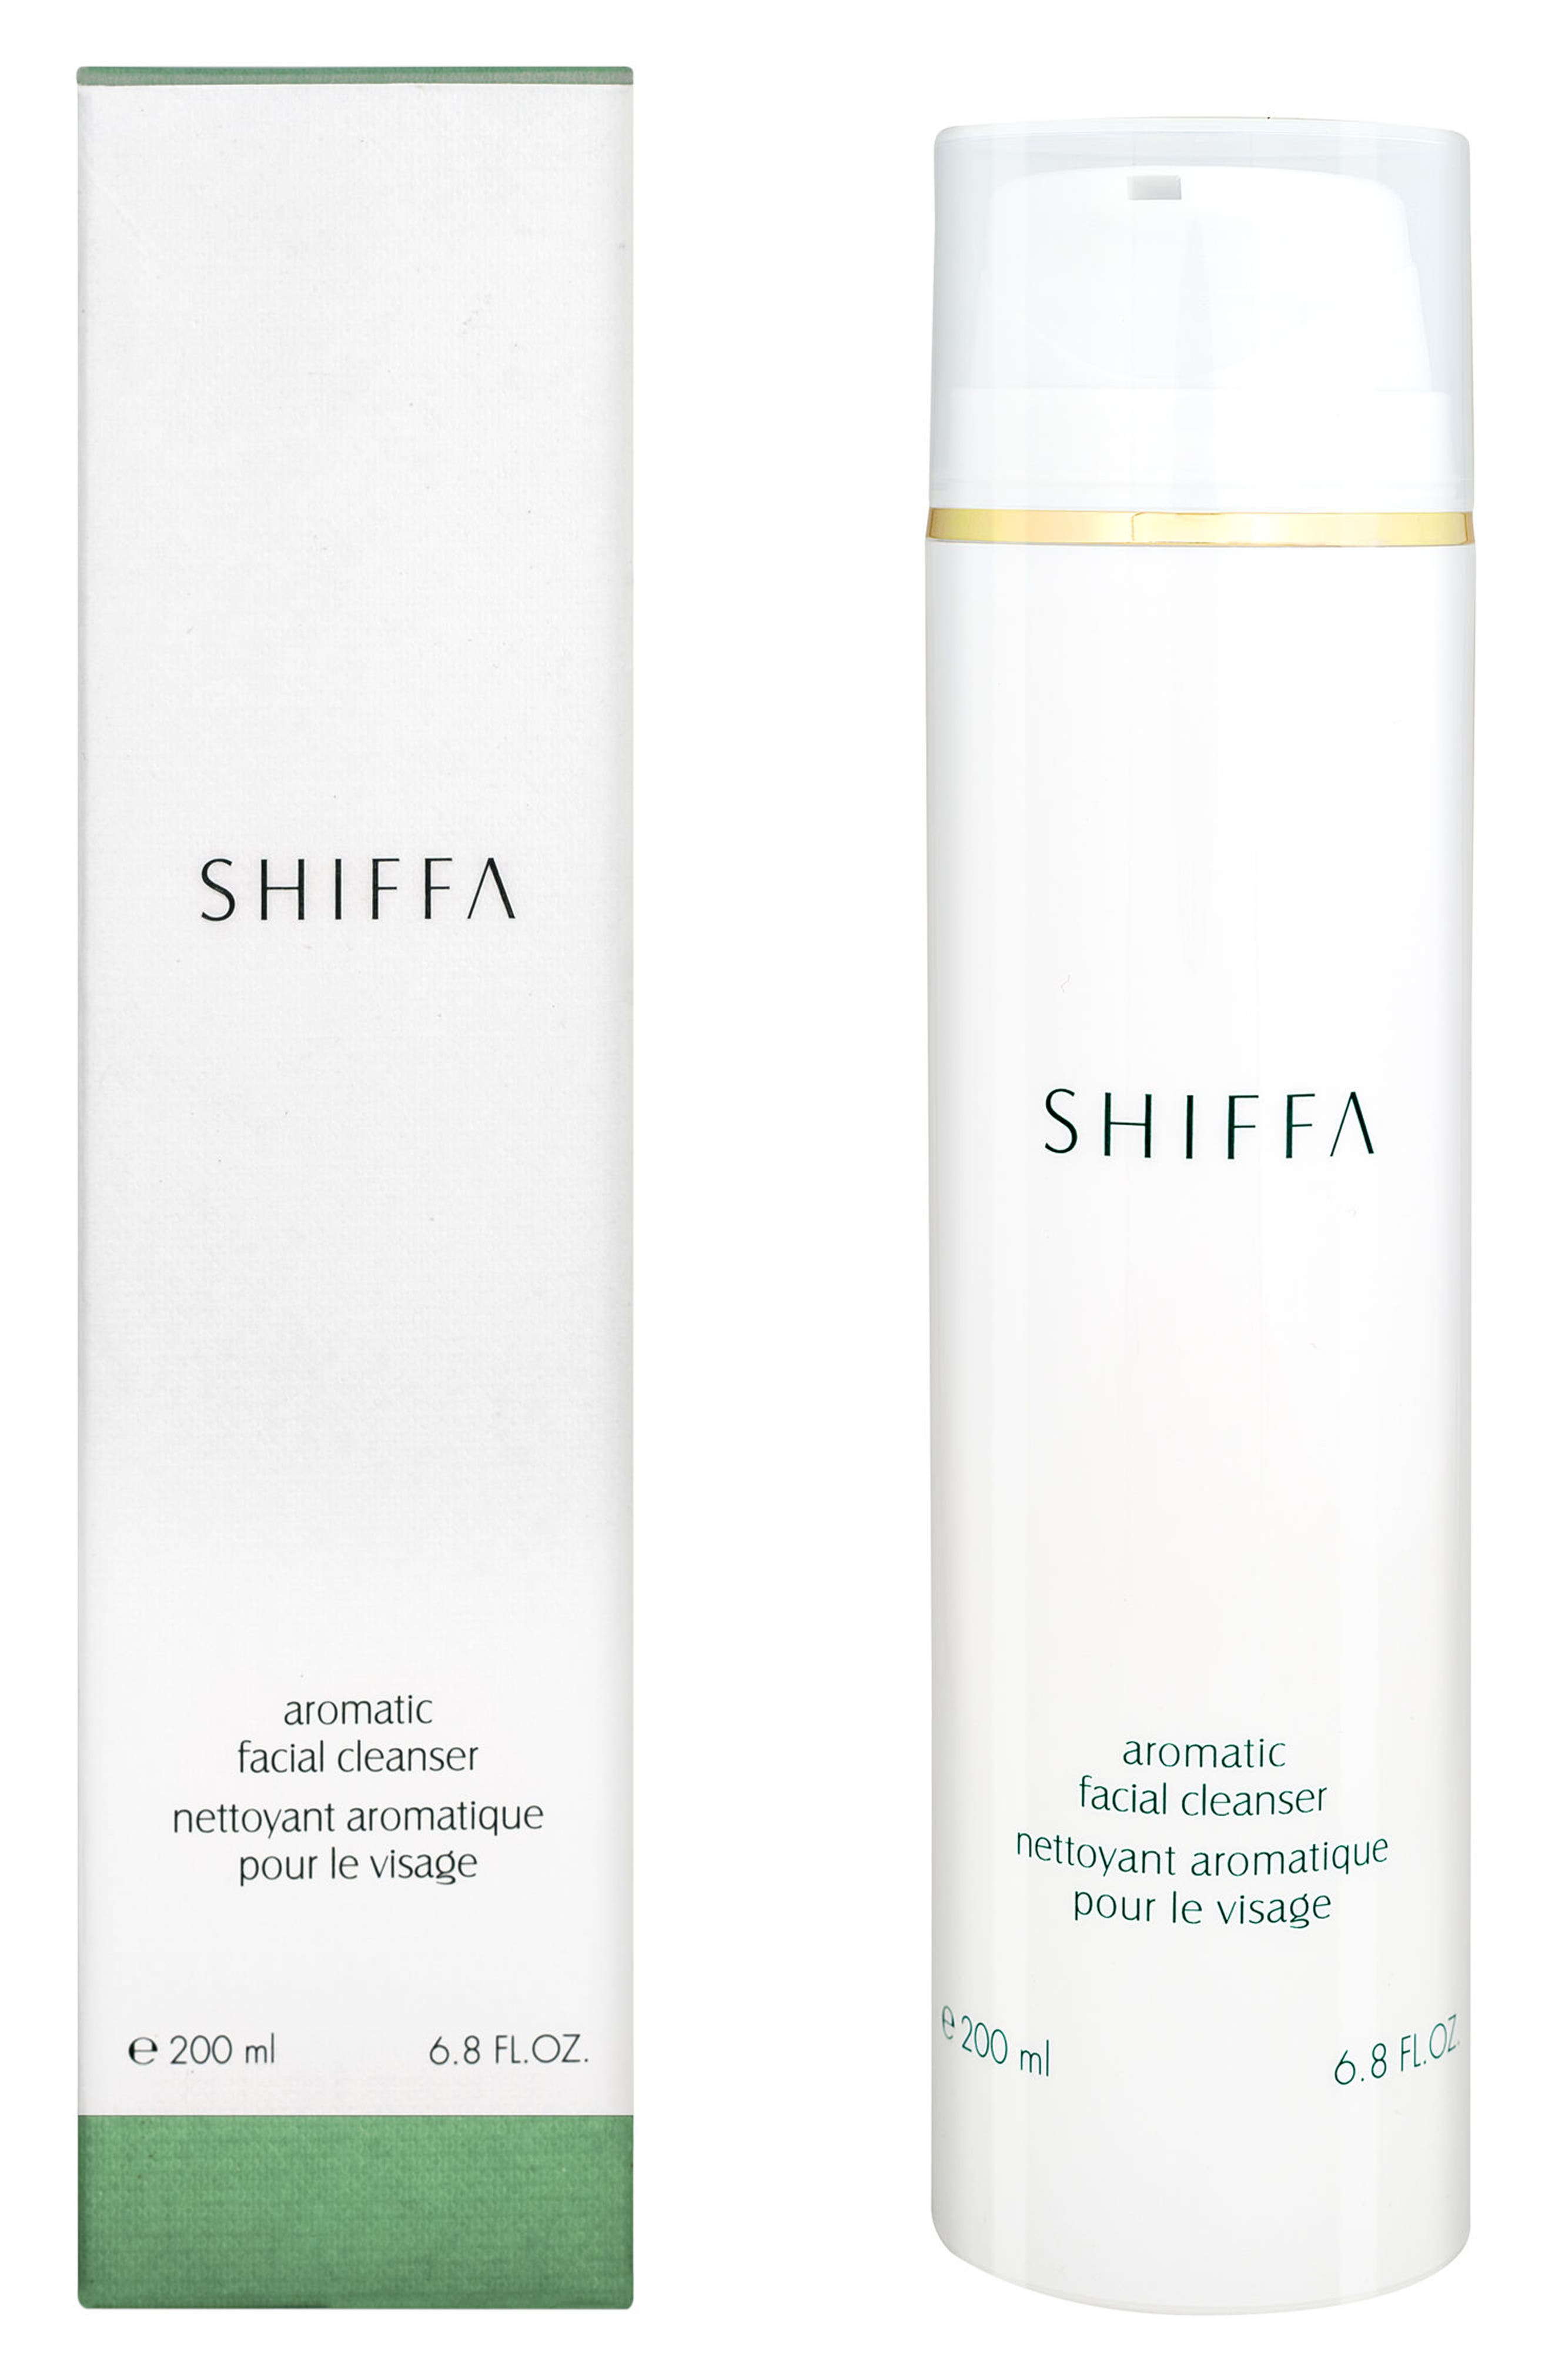 Shiffa Aromatic Facial Cleanser